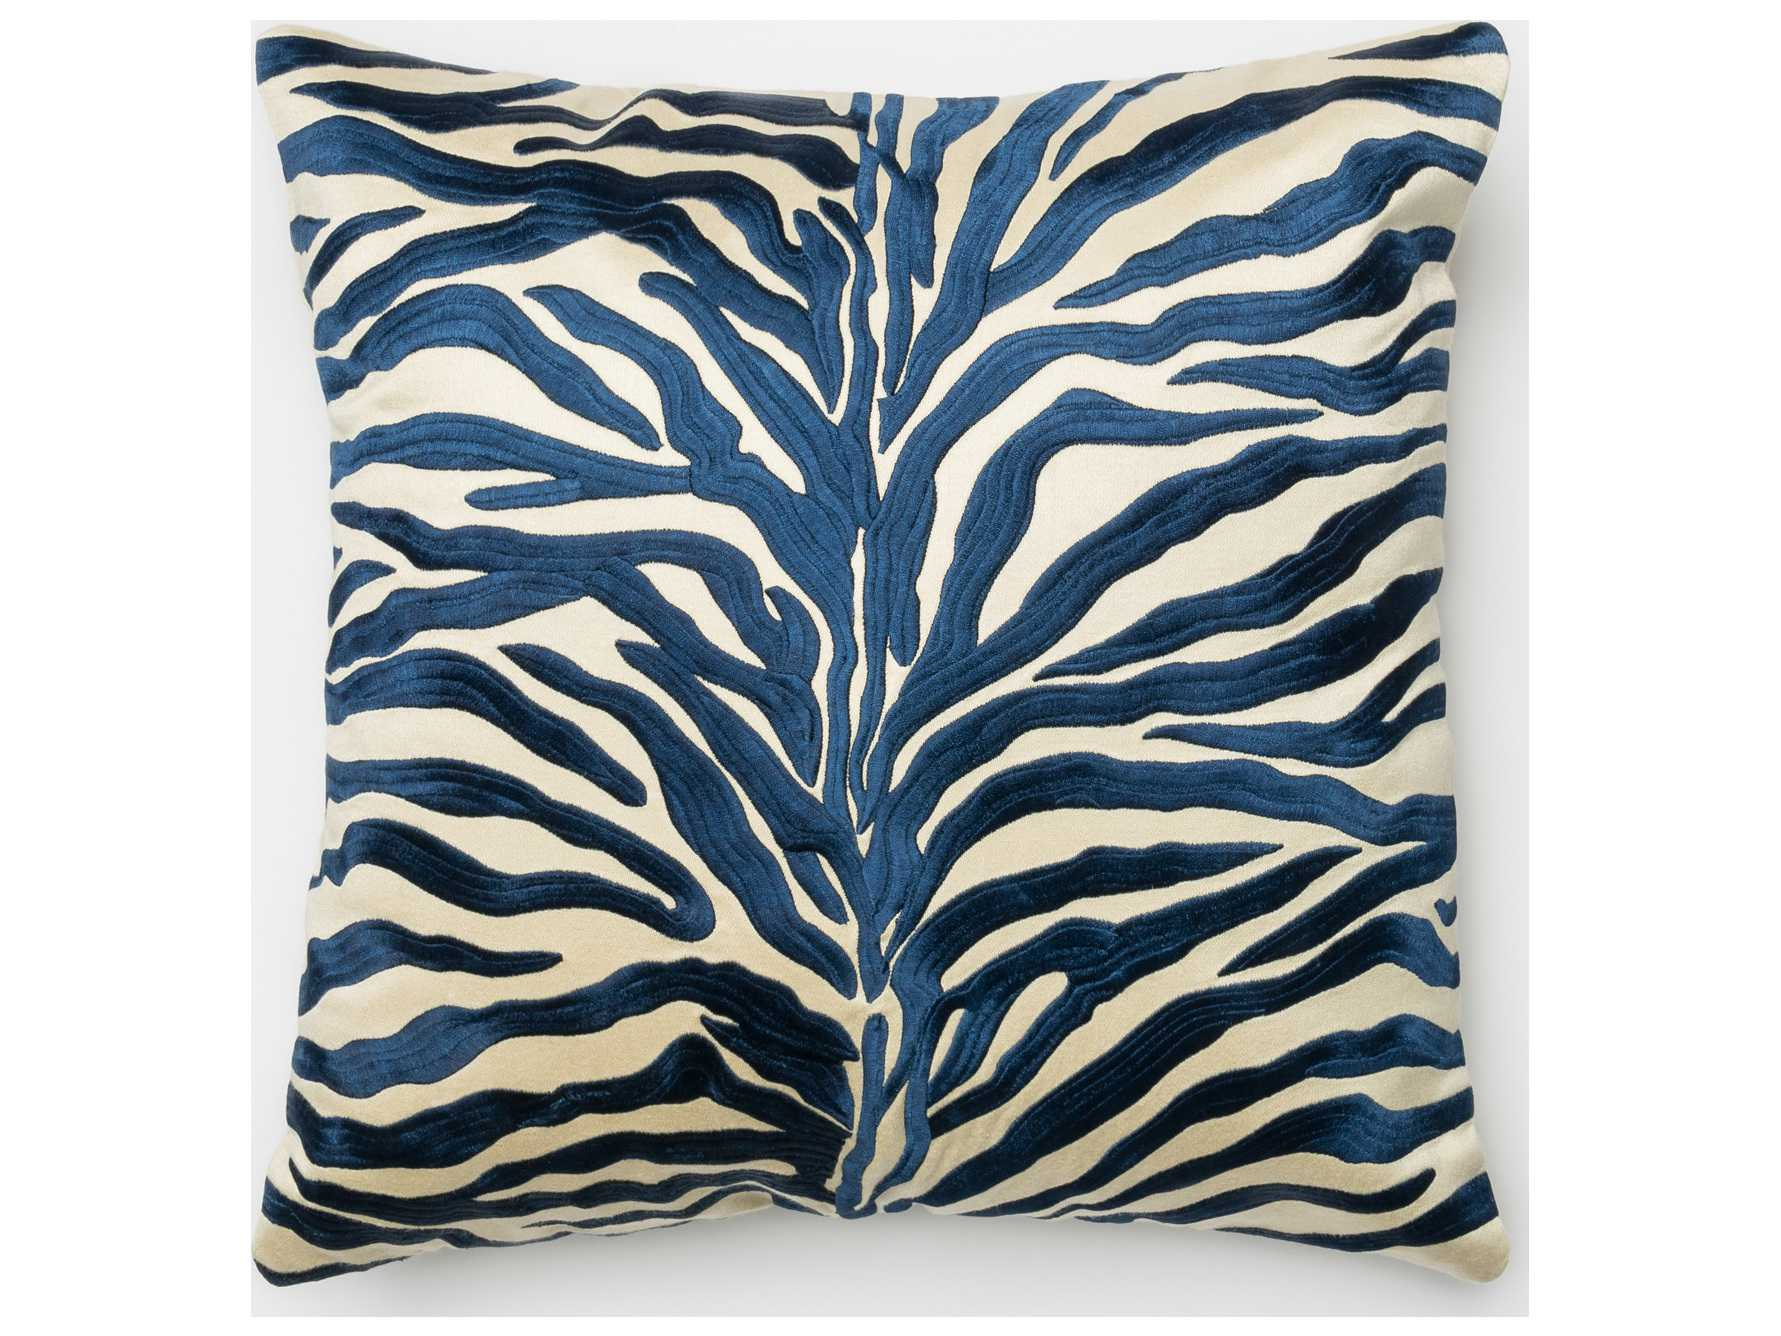 Loloi rugs 18 39 39 square blue pillow p0007bb00pil1 for Loloi pillows